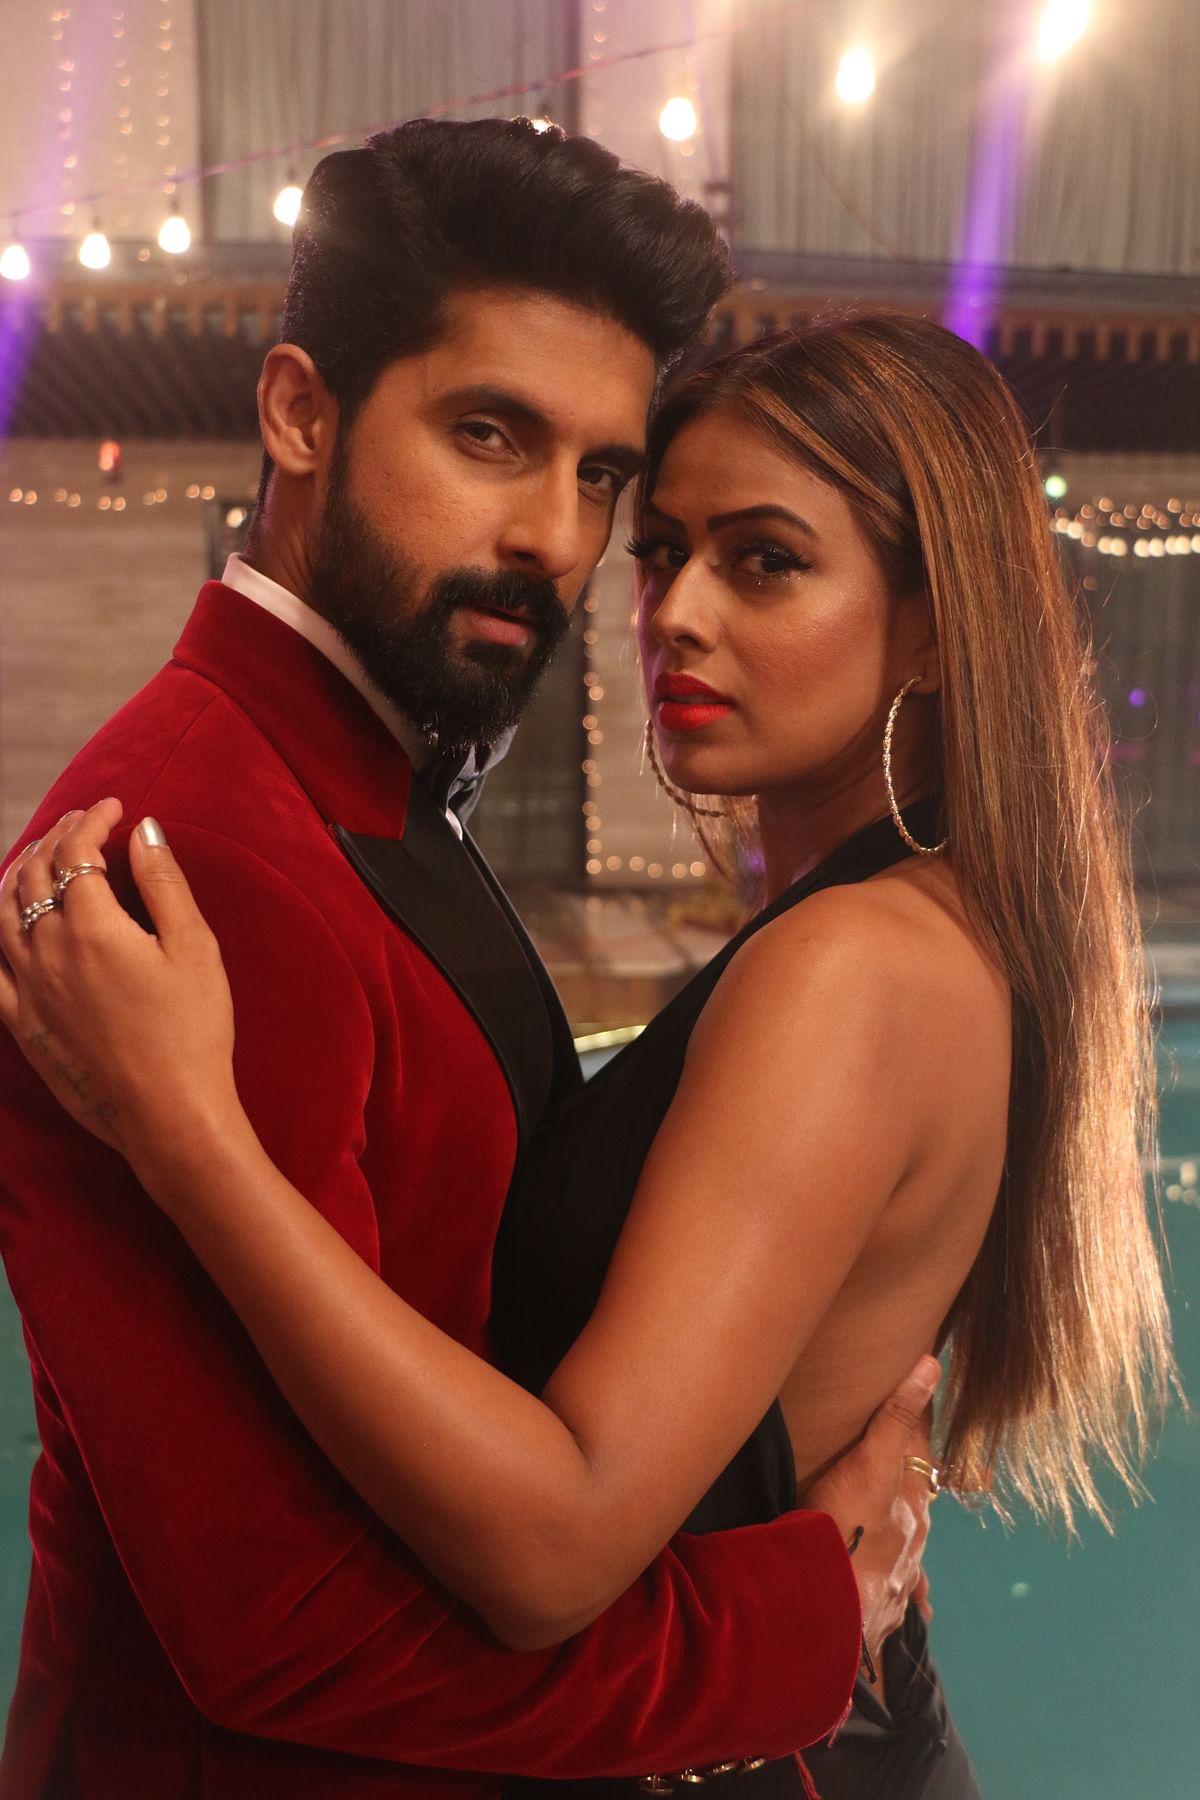 Ravi Dubey and Nia Sharma in Jamai Raja 2.0